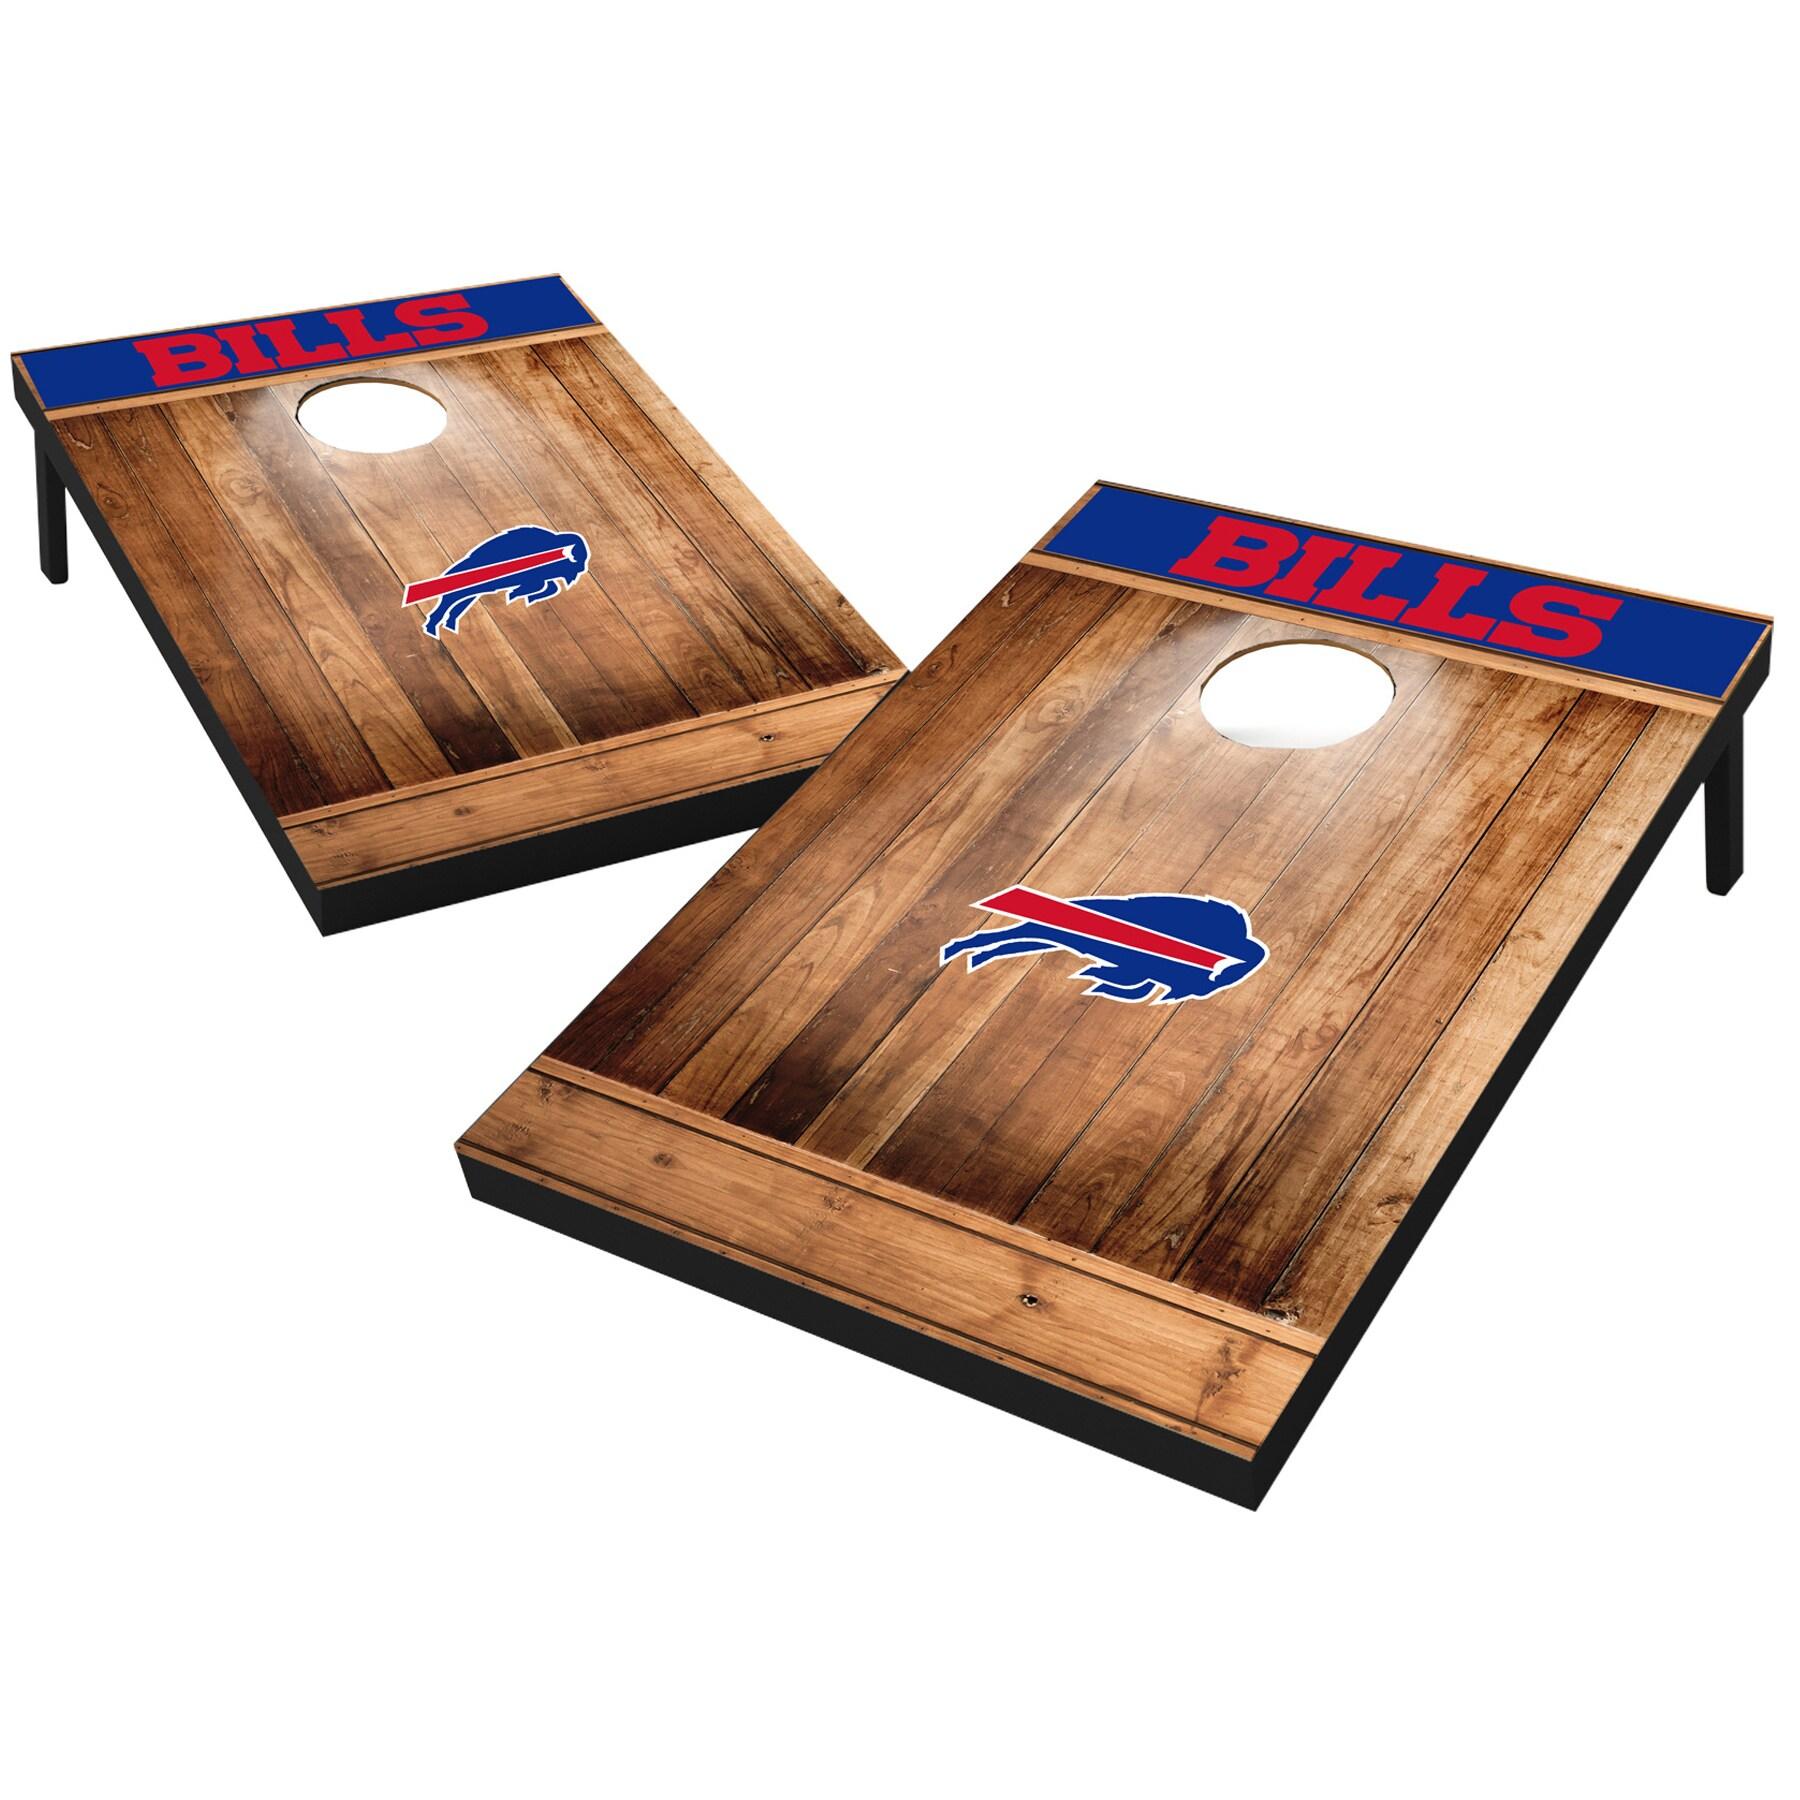 Buffalo Bills 2' x 3' Wood Design Cornhole Board Tailgate Toss Set